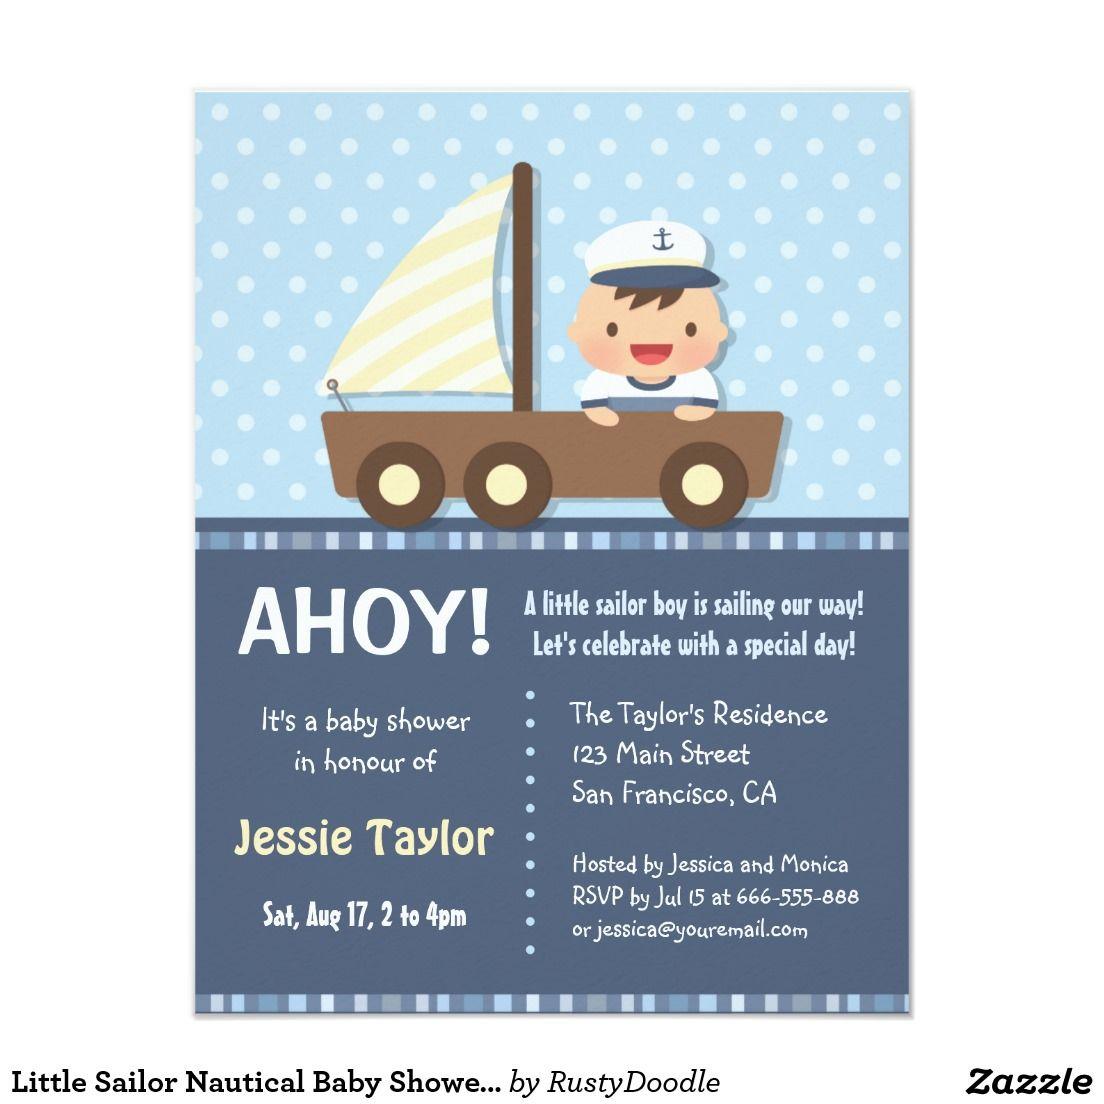 Little Sailor Nautical Baby Shower Invitations | Shower invitations